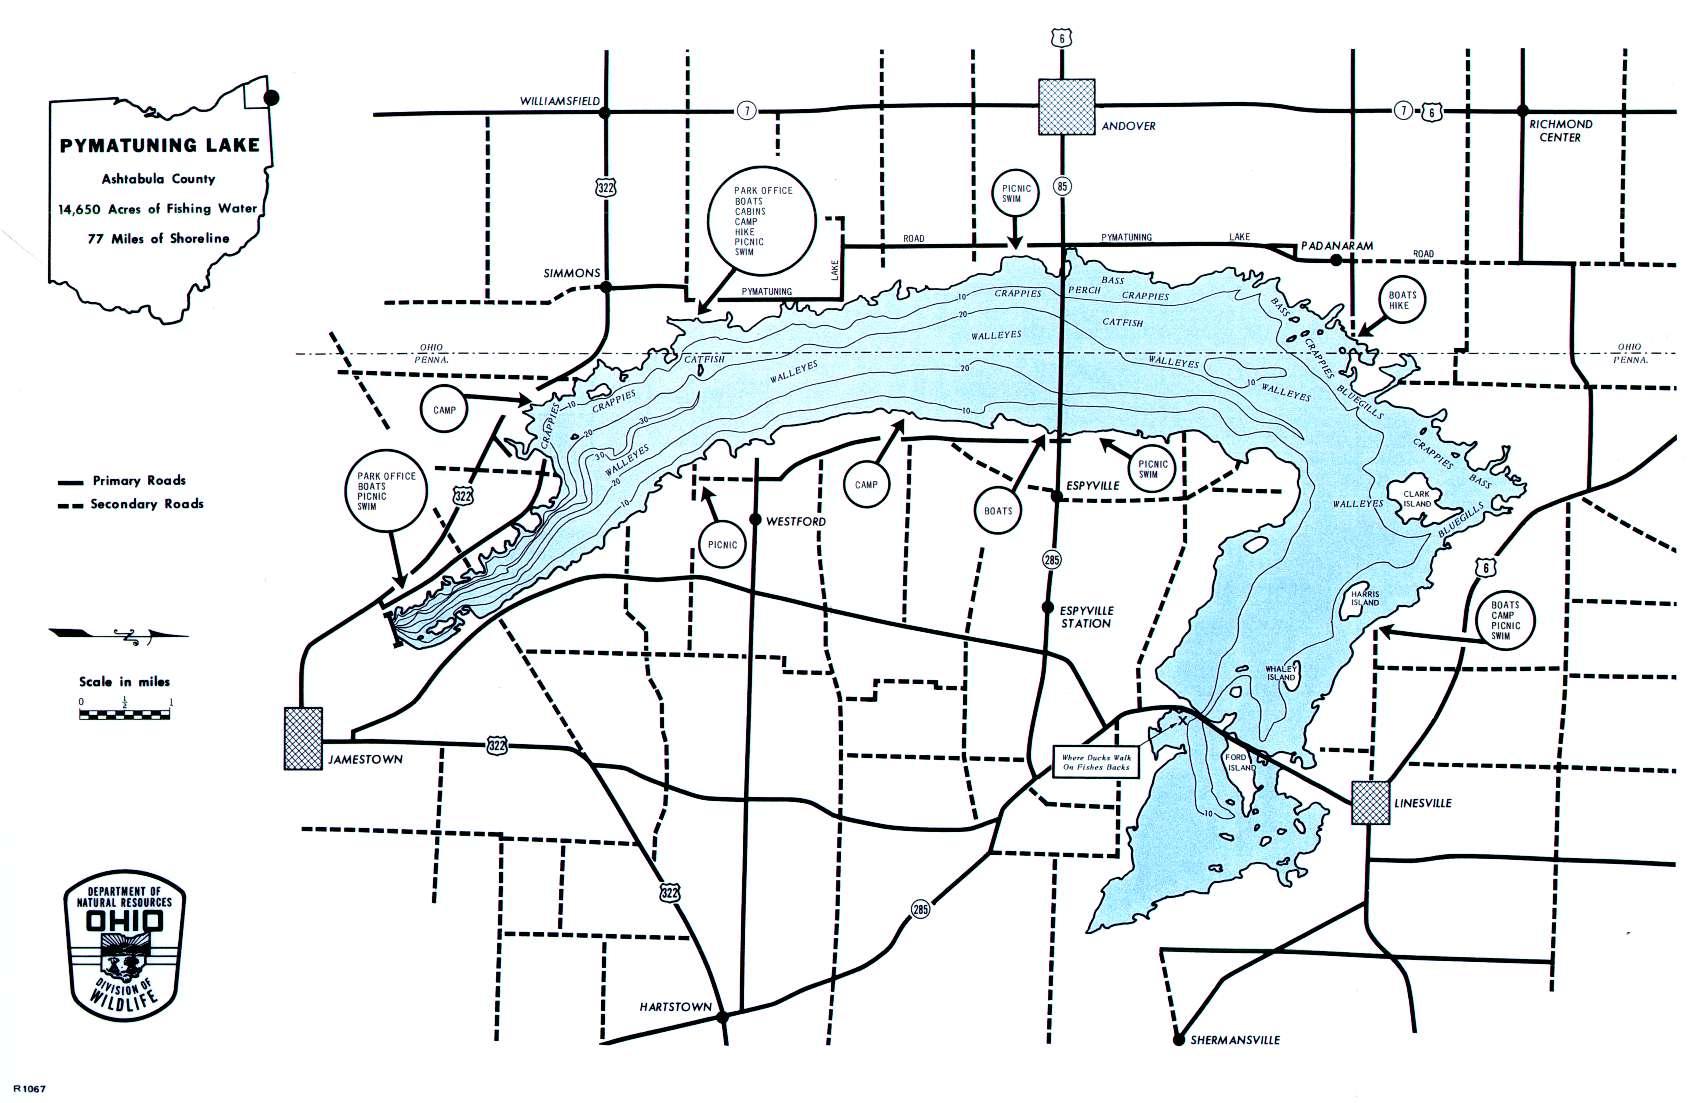 Pymatuning Lake Fishing Map - GoFishOhio